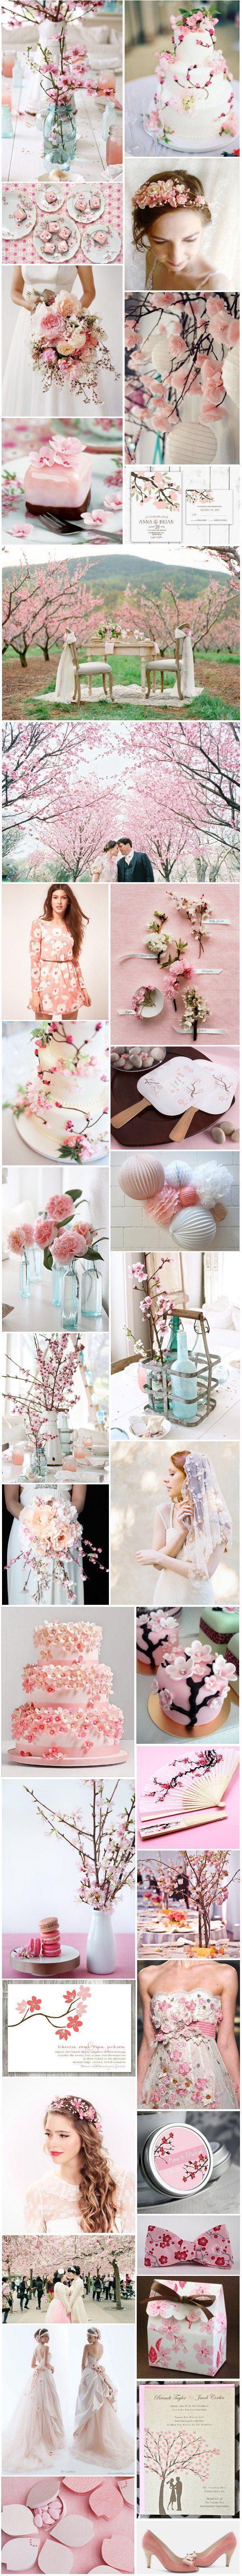 [Inspiration] Fleurs de cerisier